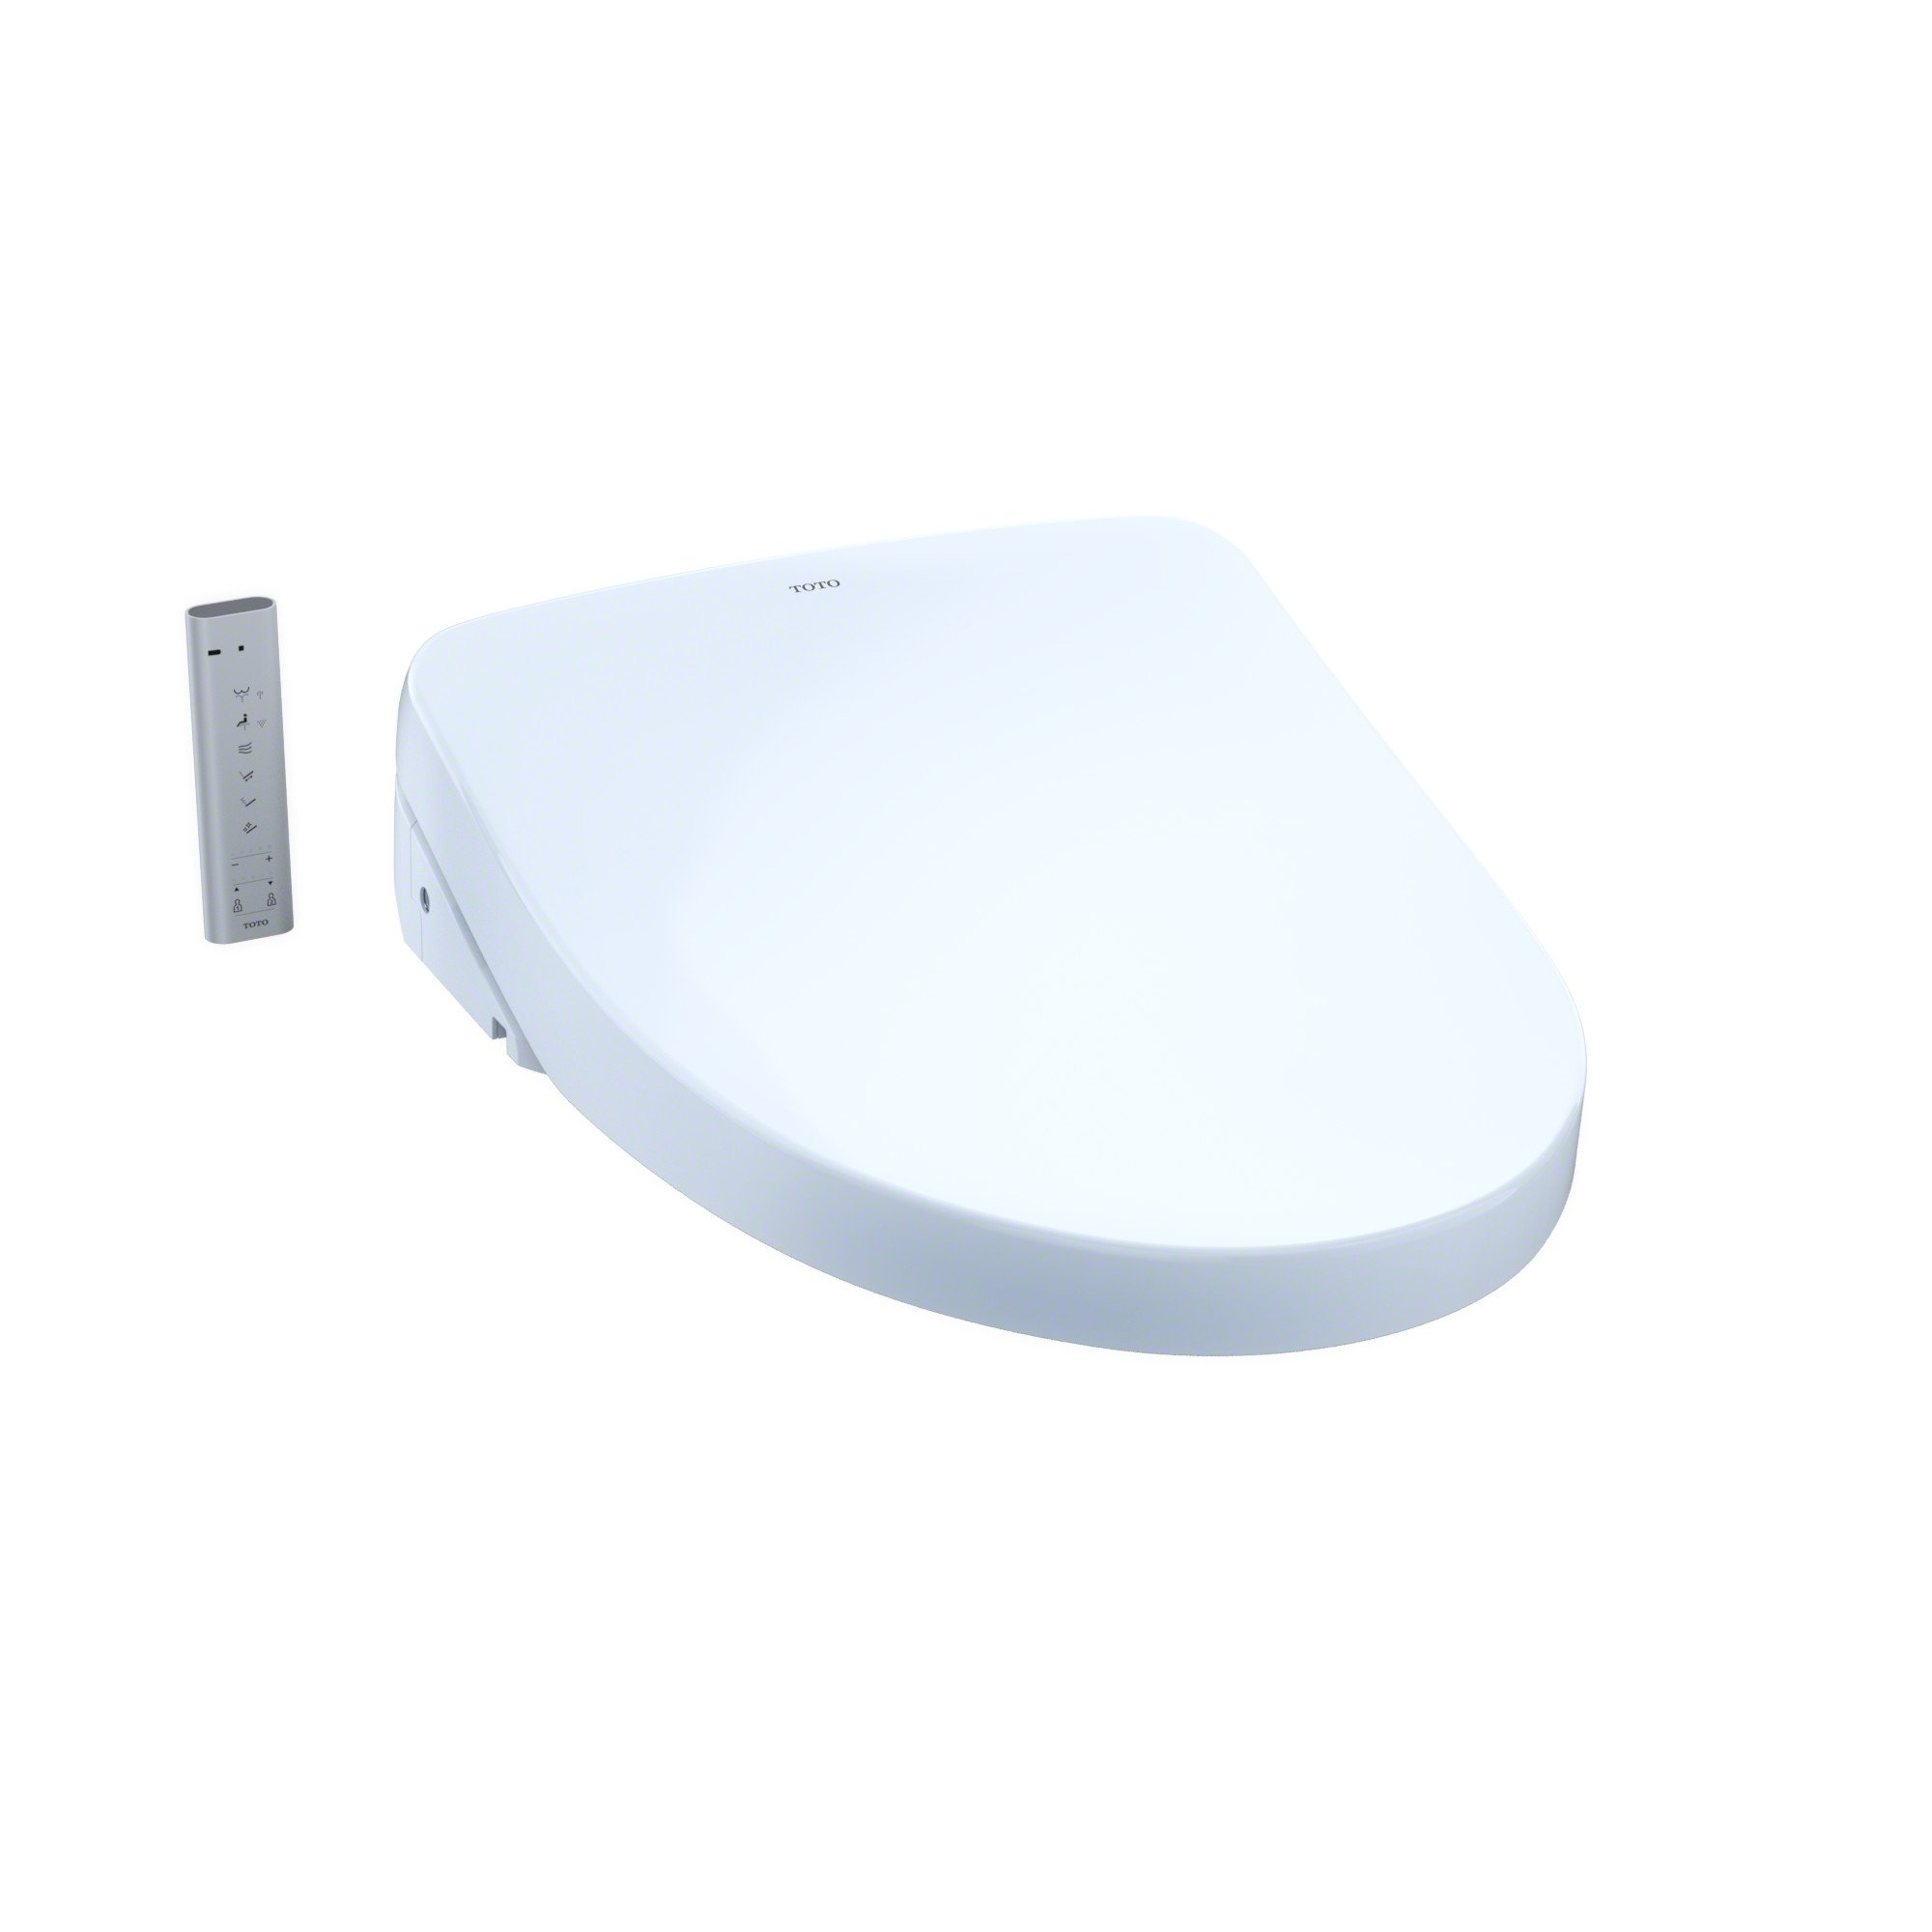 Best Bidet Toilet Seat 2020 Best Rated in Bidet Seats & Helpful Customer Reviews   Amazon.com